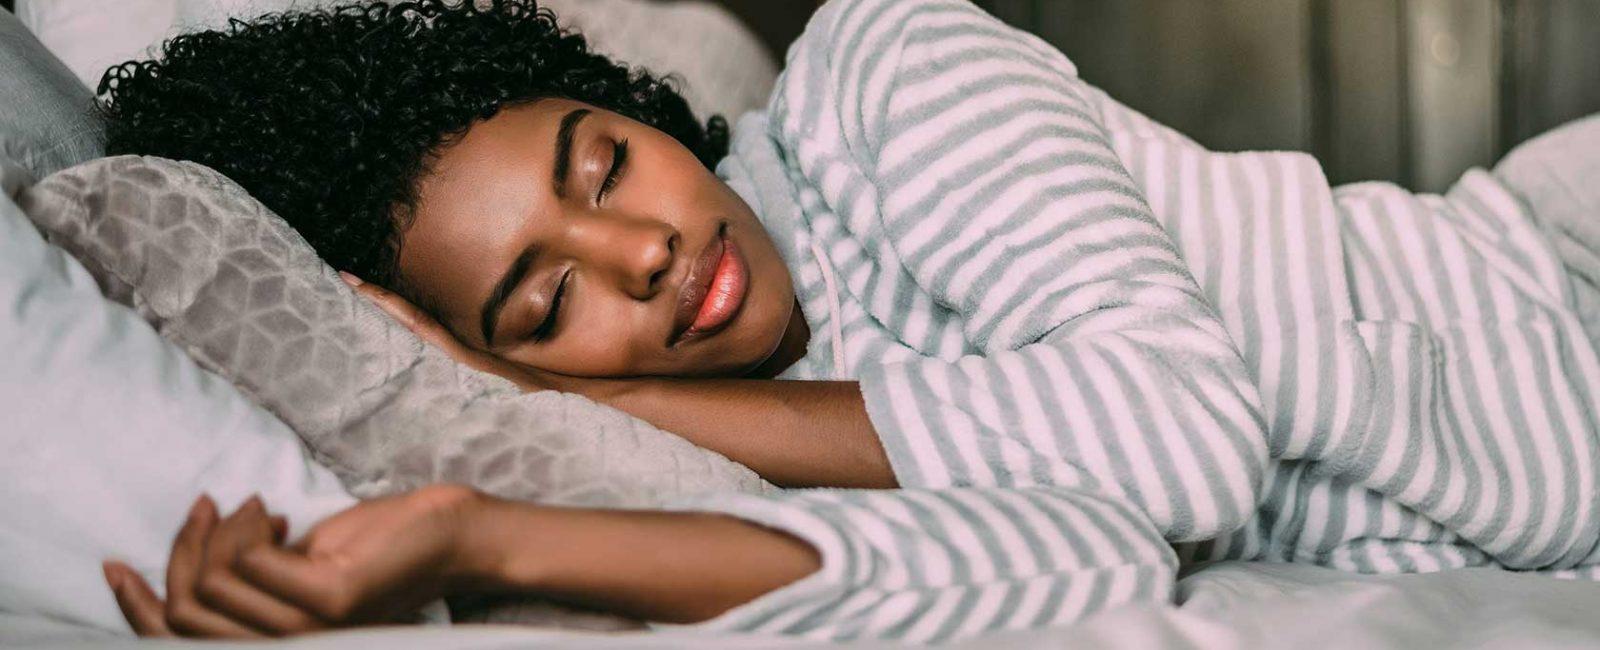 Sleep Habits for Healthy Lifestyle Habits